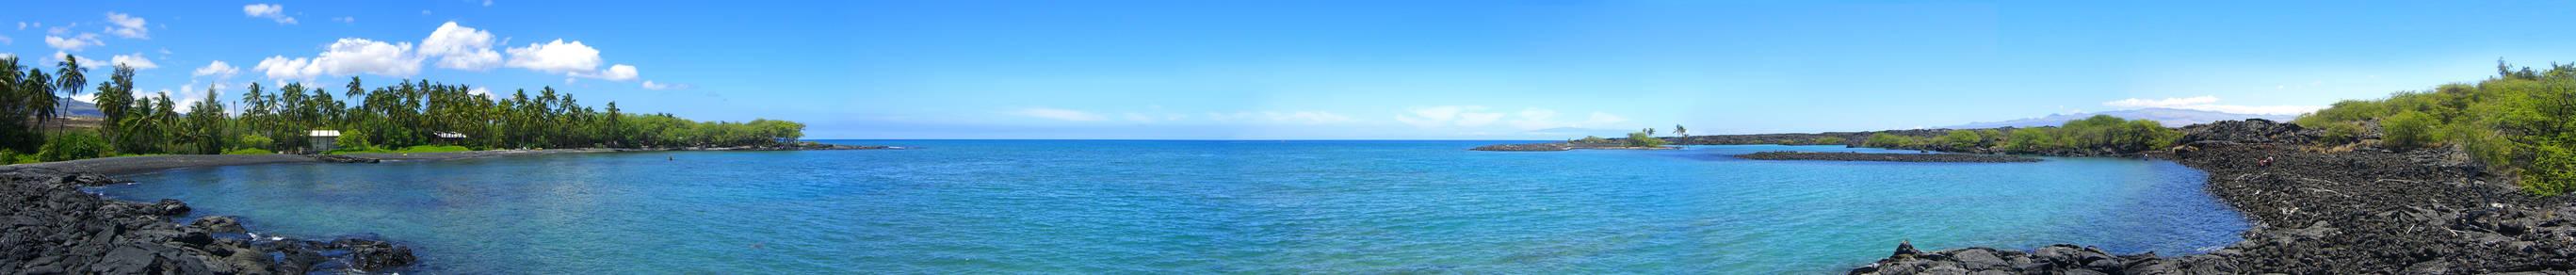 Kiholo Tutle Lagoon